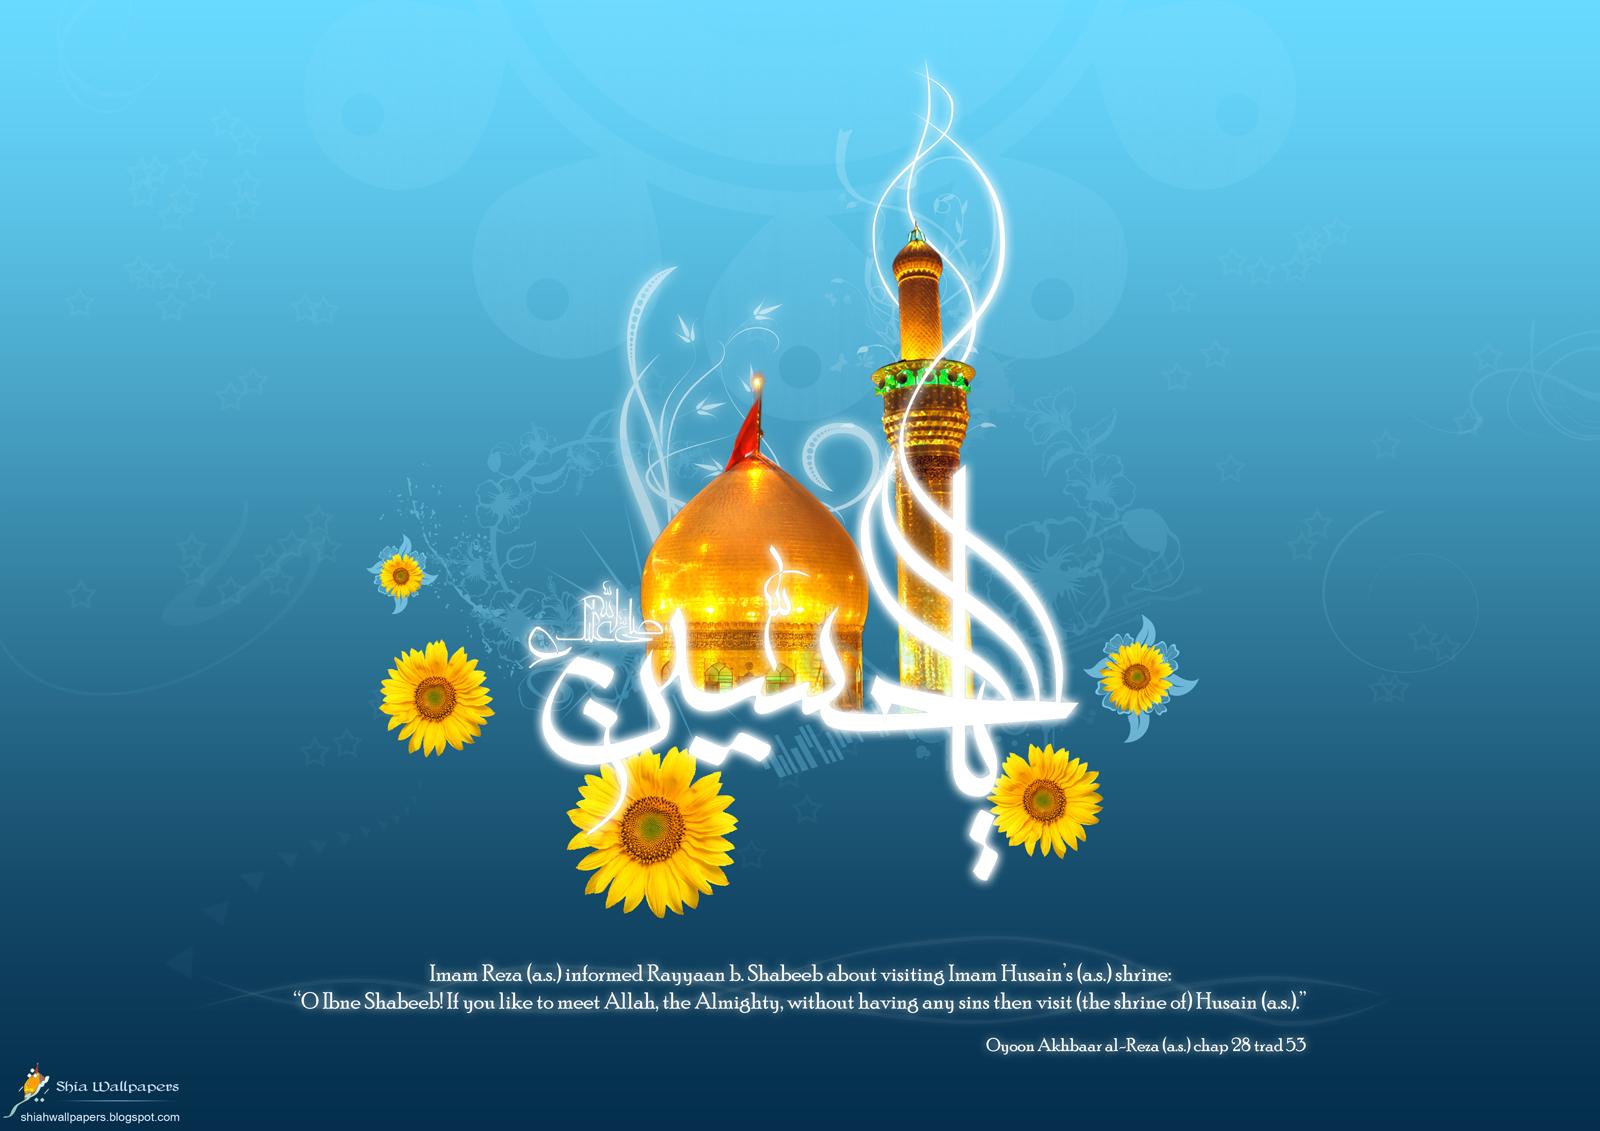 Ammu Fátima Zahra Breve Biografia Del Imam Husein As